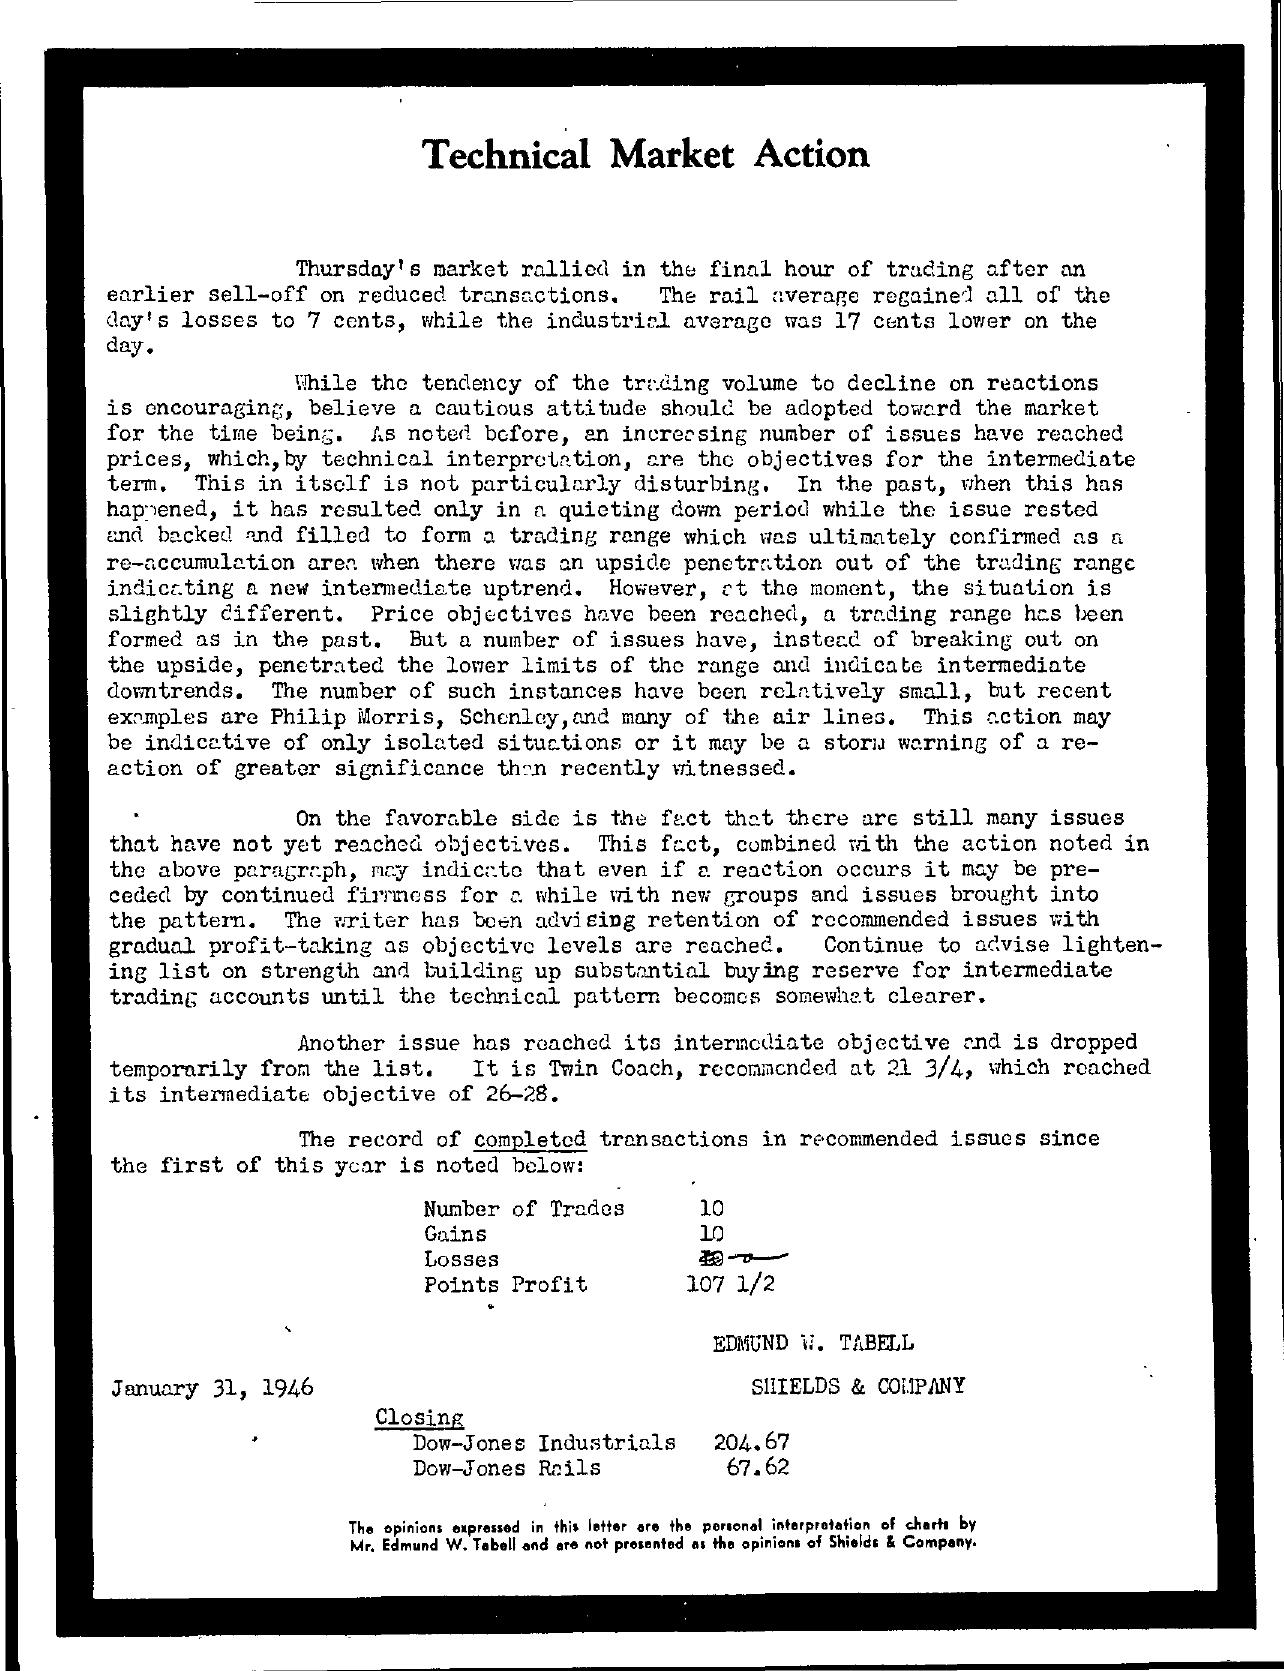 Tabell's Market Letter - January 31, 1946